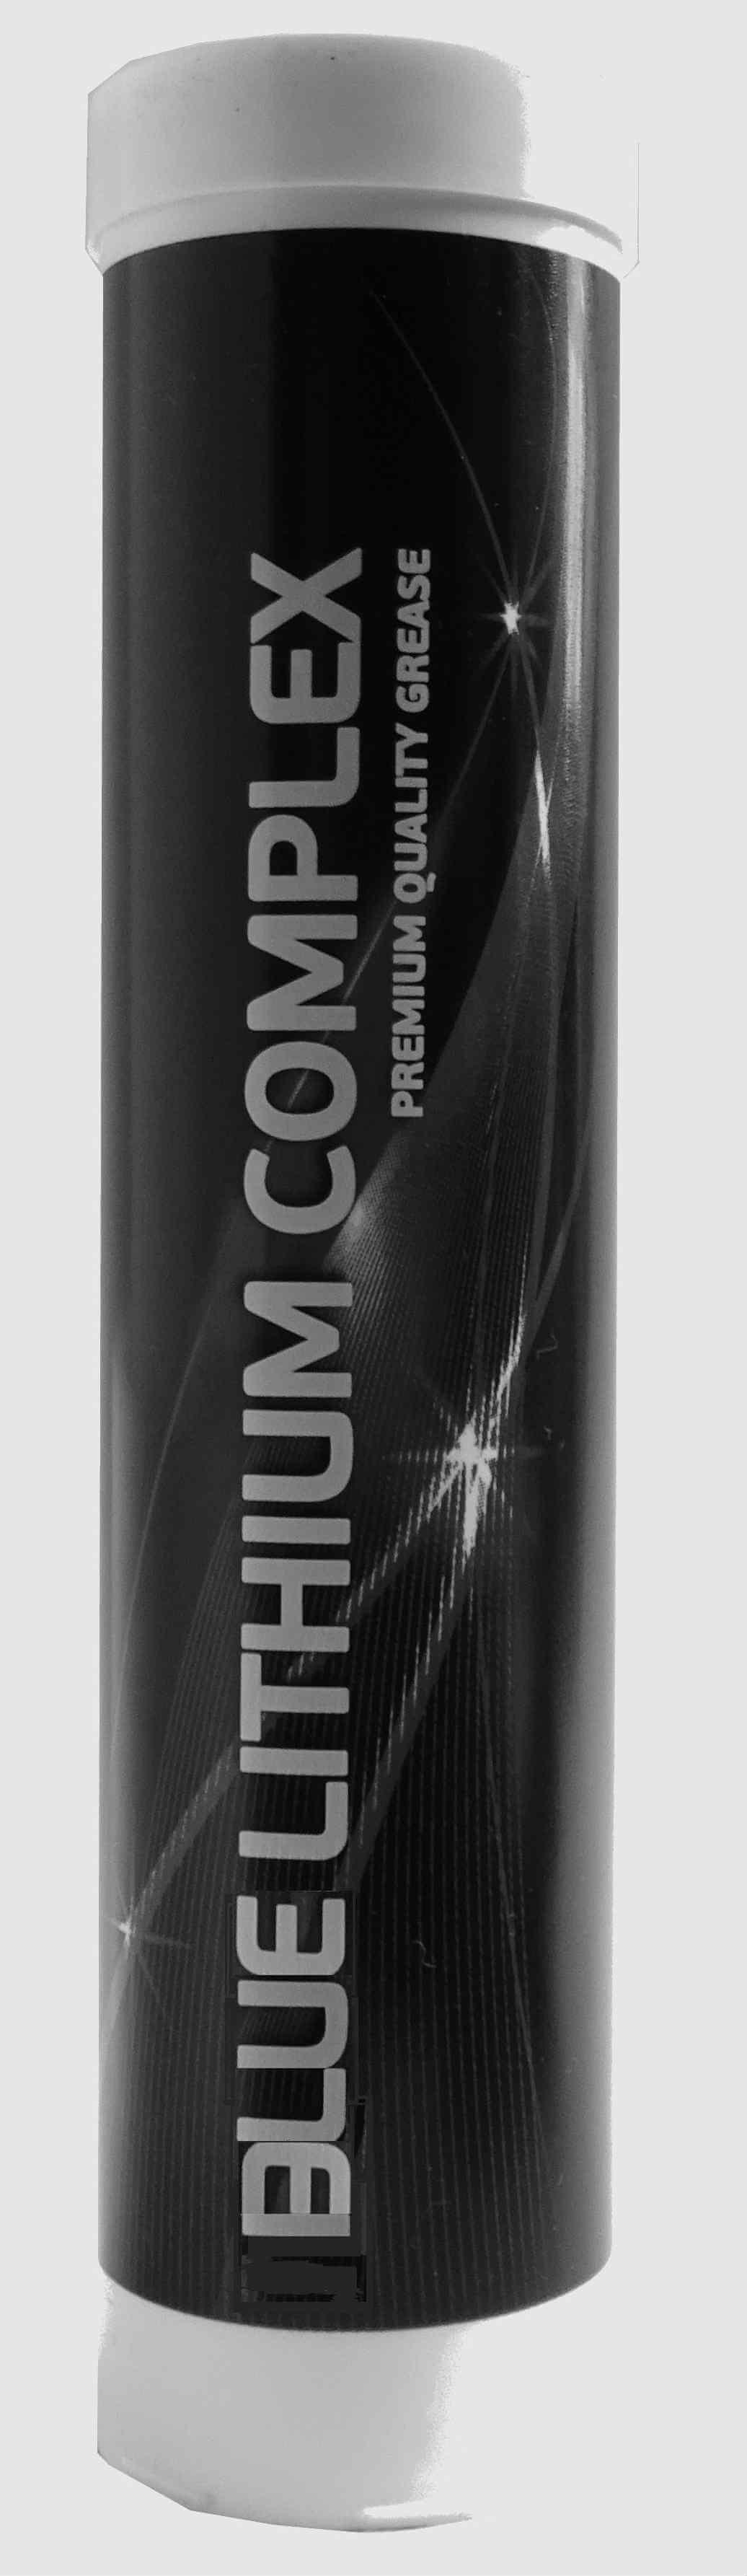 Lithium Synplex Blue Cartridge EP2